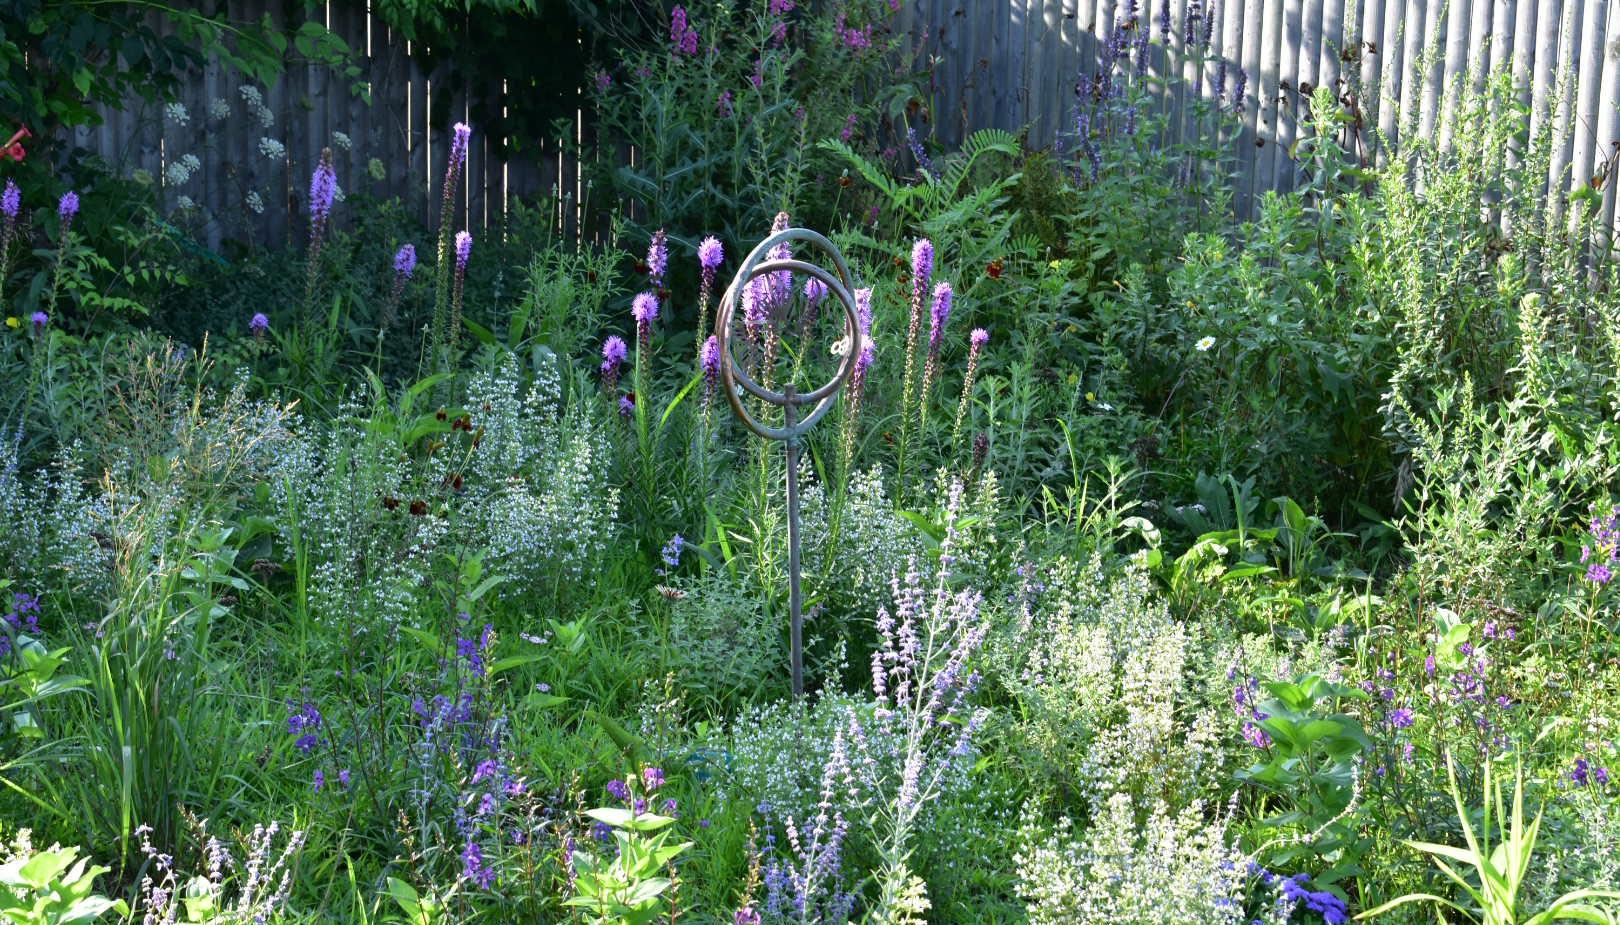 Comfortable Enchanted Garden Images - Landscaping Ideas for Backyard ...